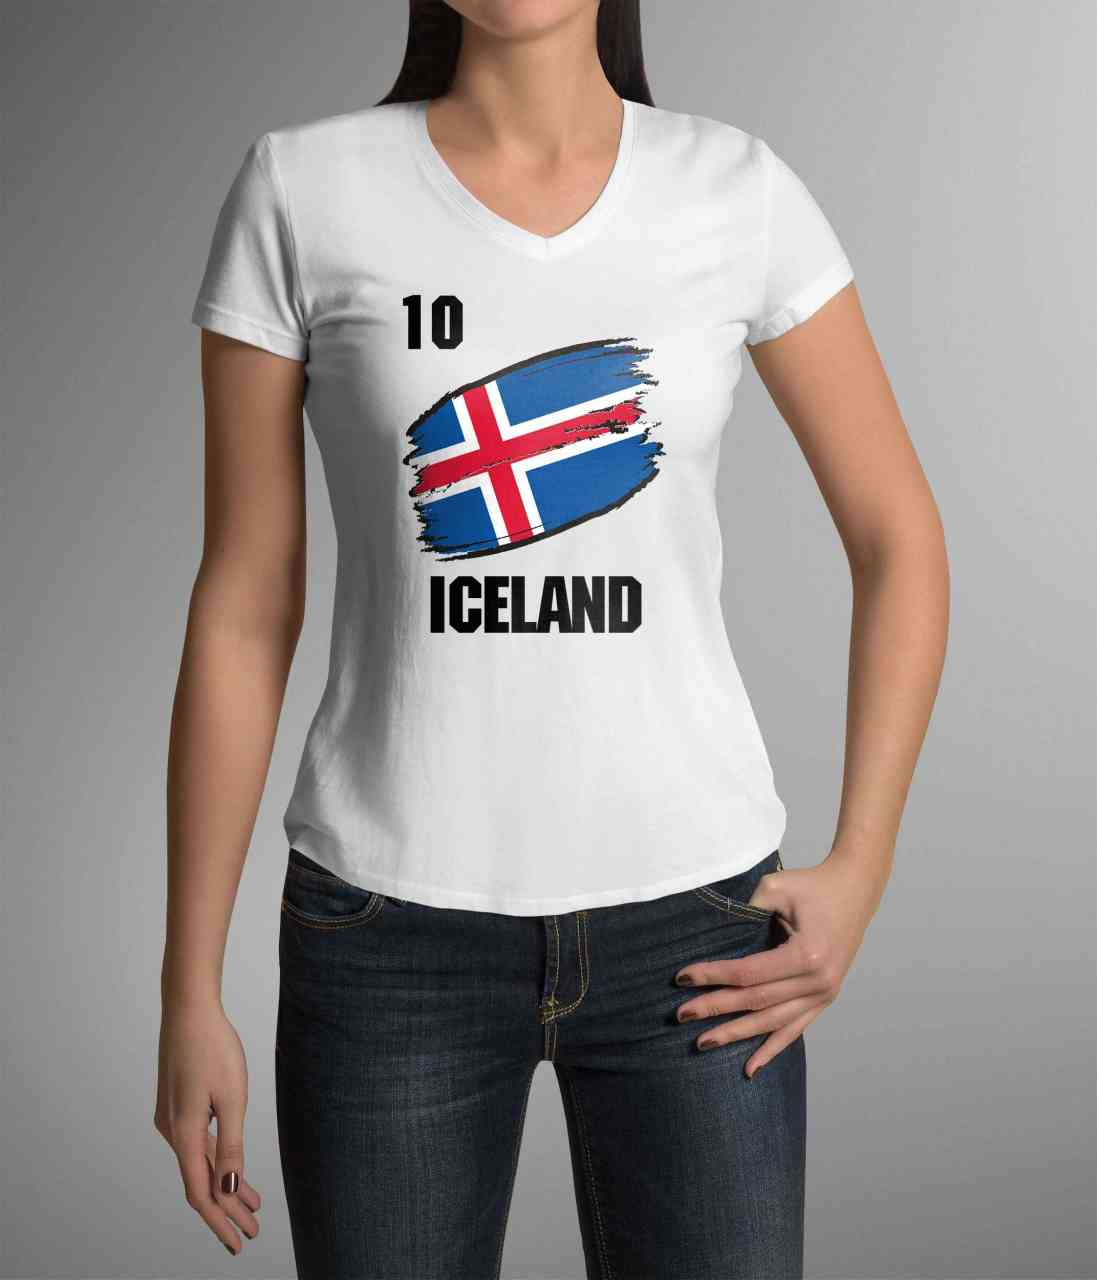 Iceland | Island | Männer oder Frauen Trikot T - Shirt mit Wunsch Nummer + Wunsch Name | WM 2018